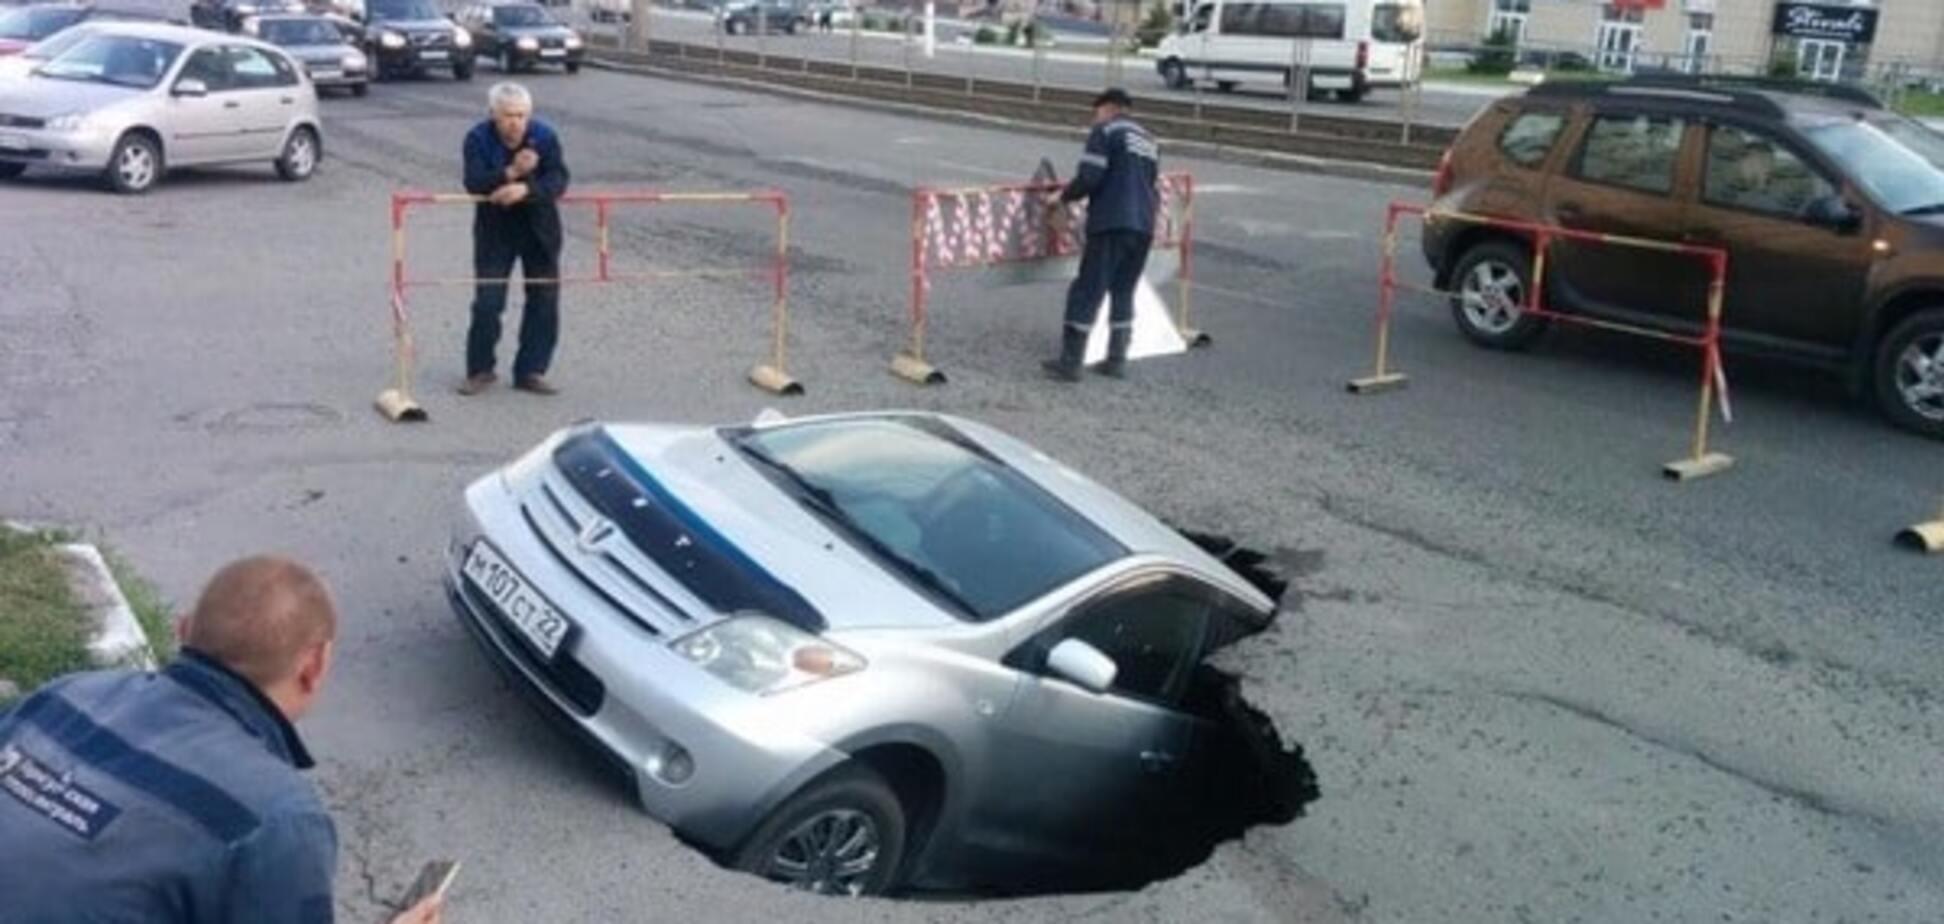 Барнаул. авто, машина, асфальт